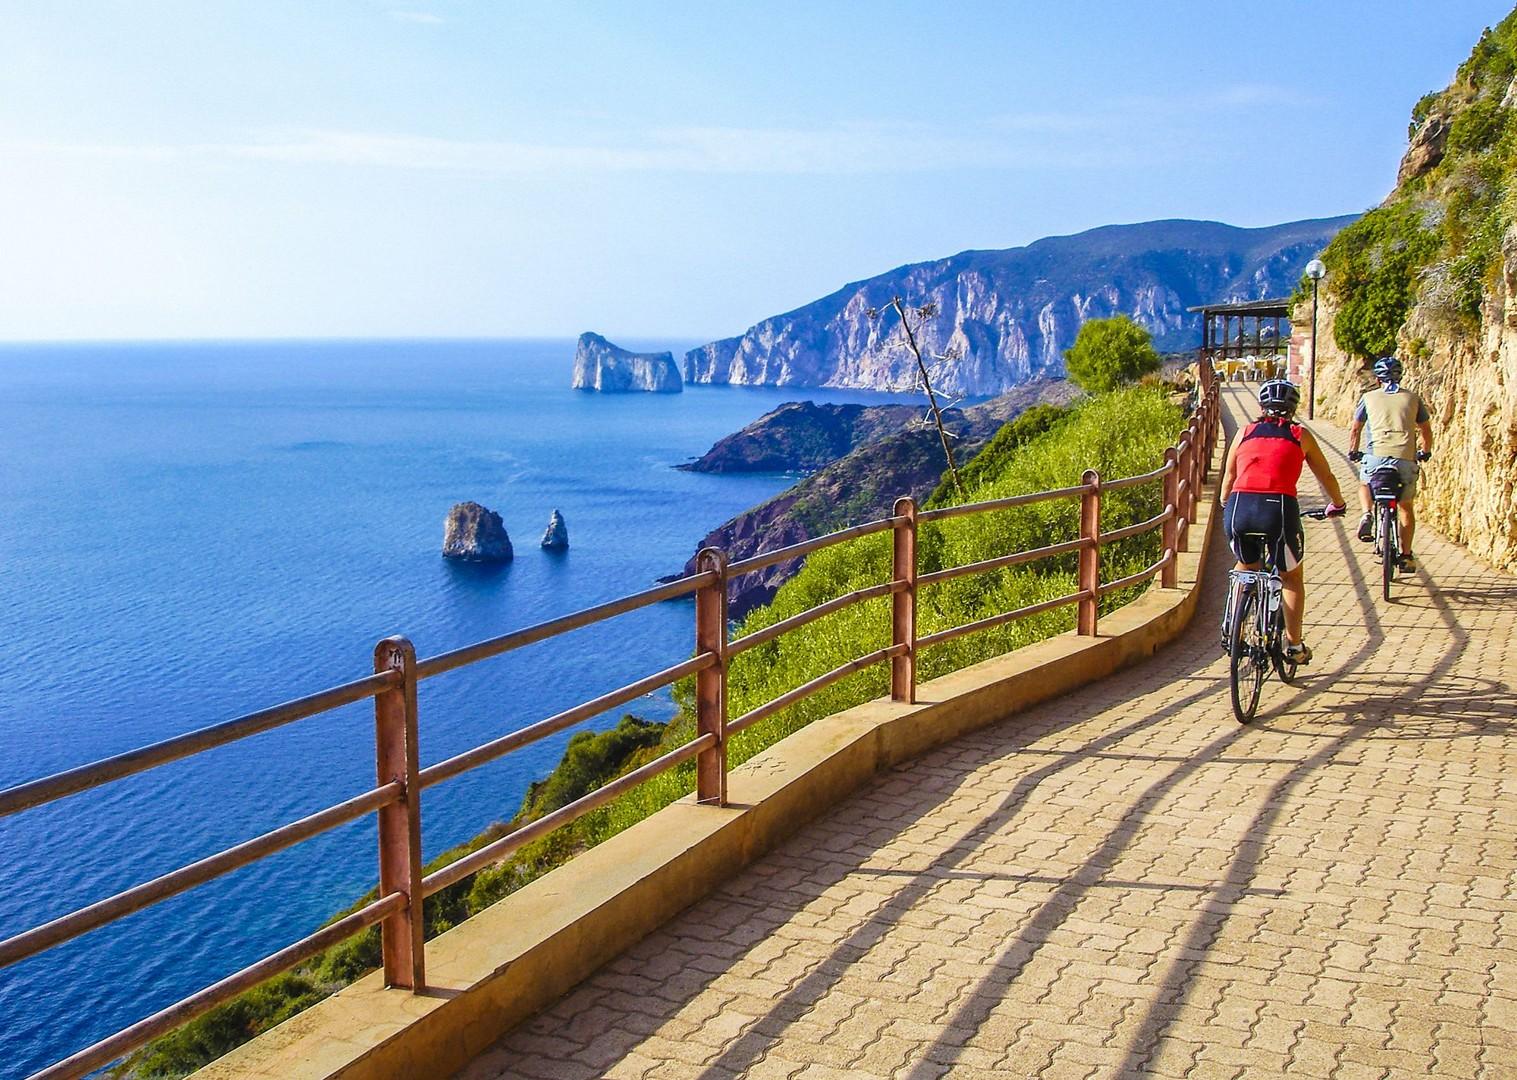 fdfsdfsdfsdfsdfsdf4.jpg - Italy - Sardinia - Island Flavours - Italia Leisure and Family Cycling